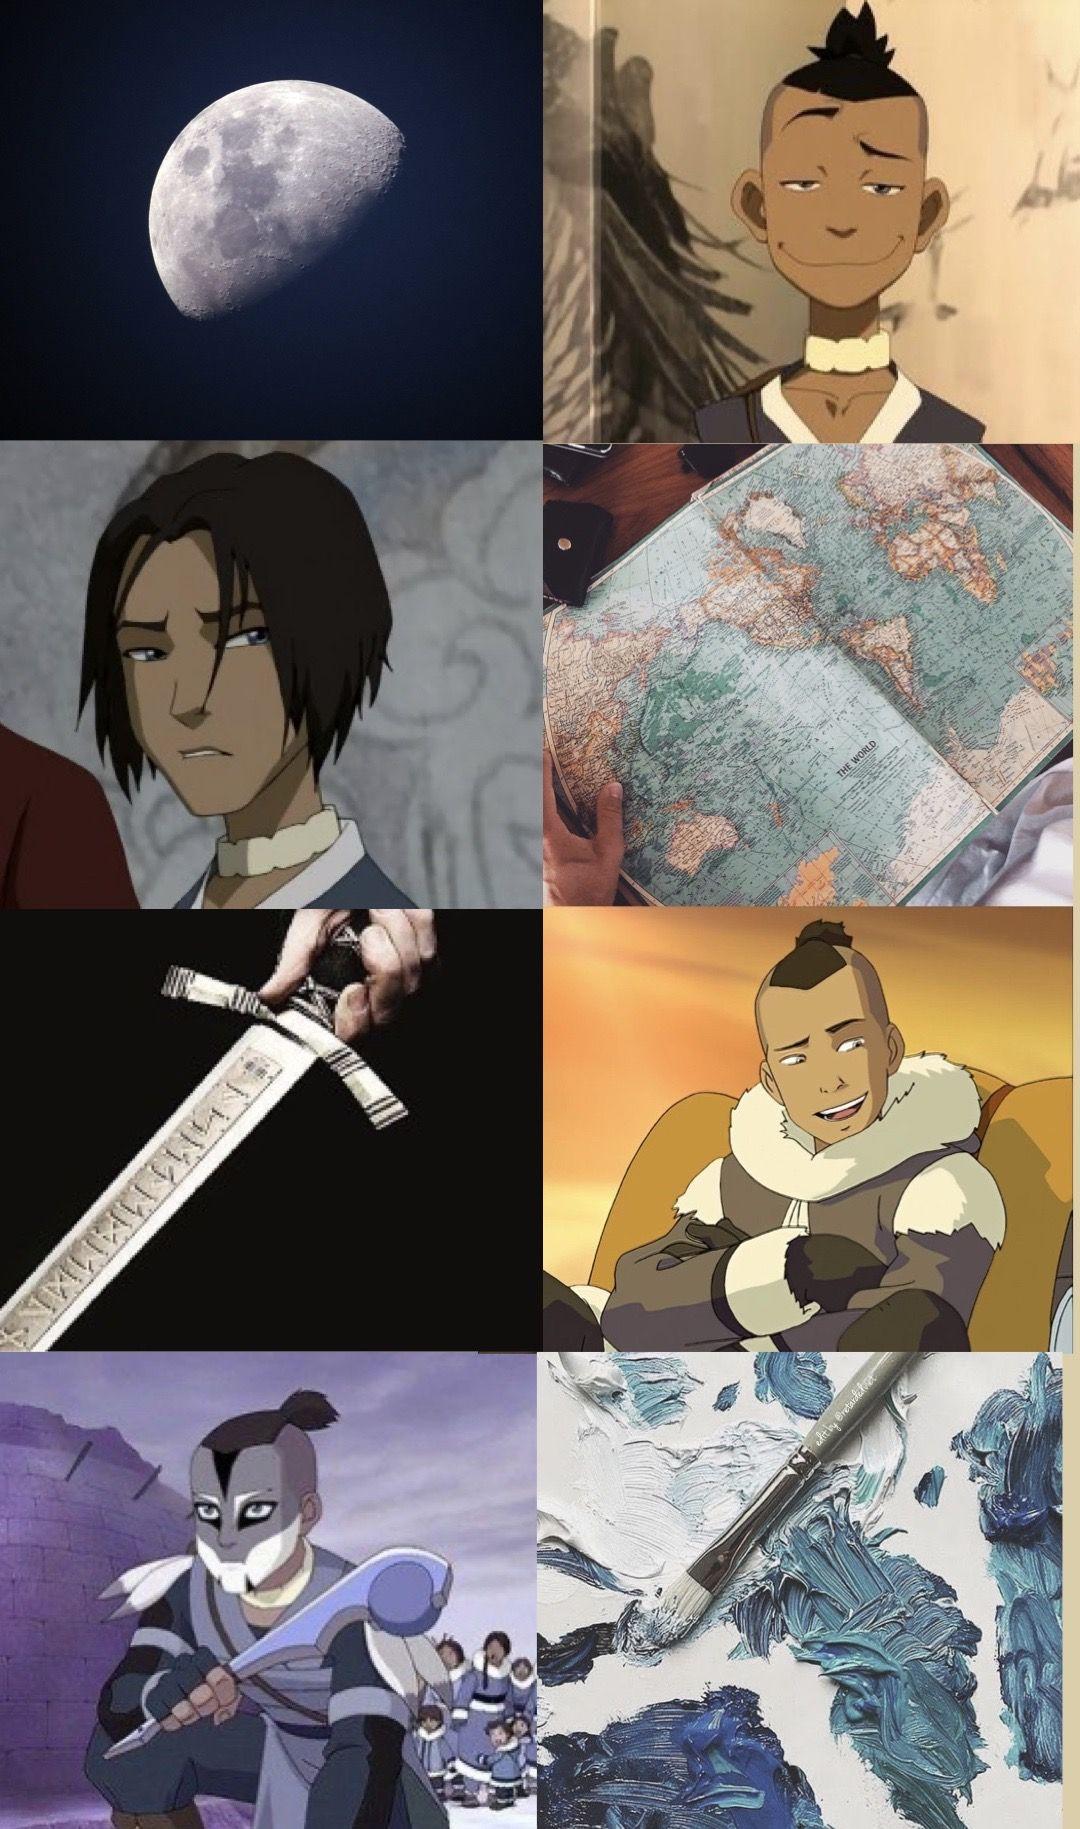 Sokka Wallpaper In 2020 Avatar The Last Airbender Art Avatar Airbender Avatar Aang